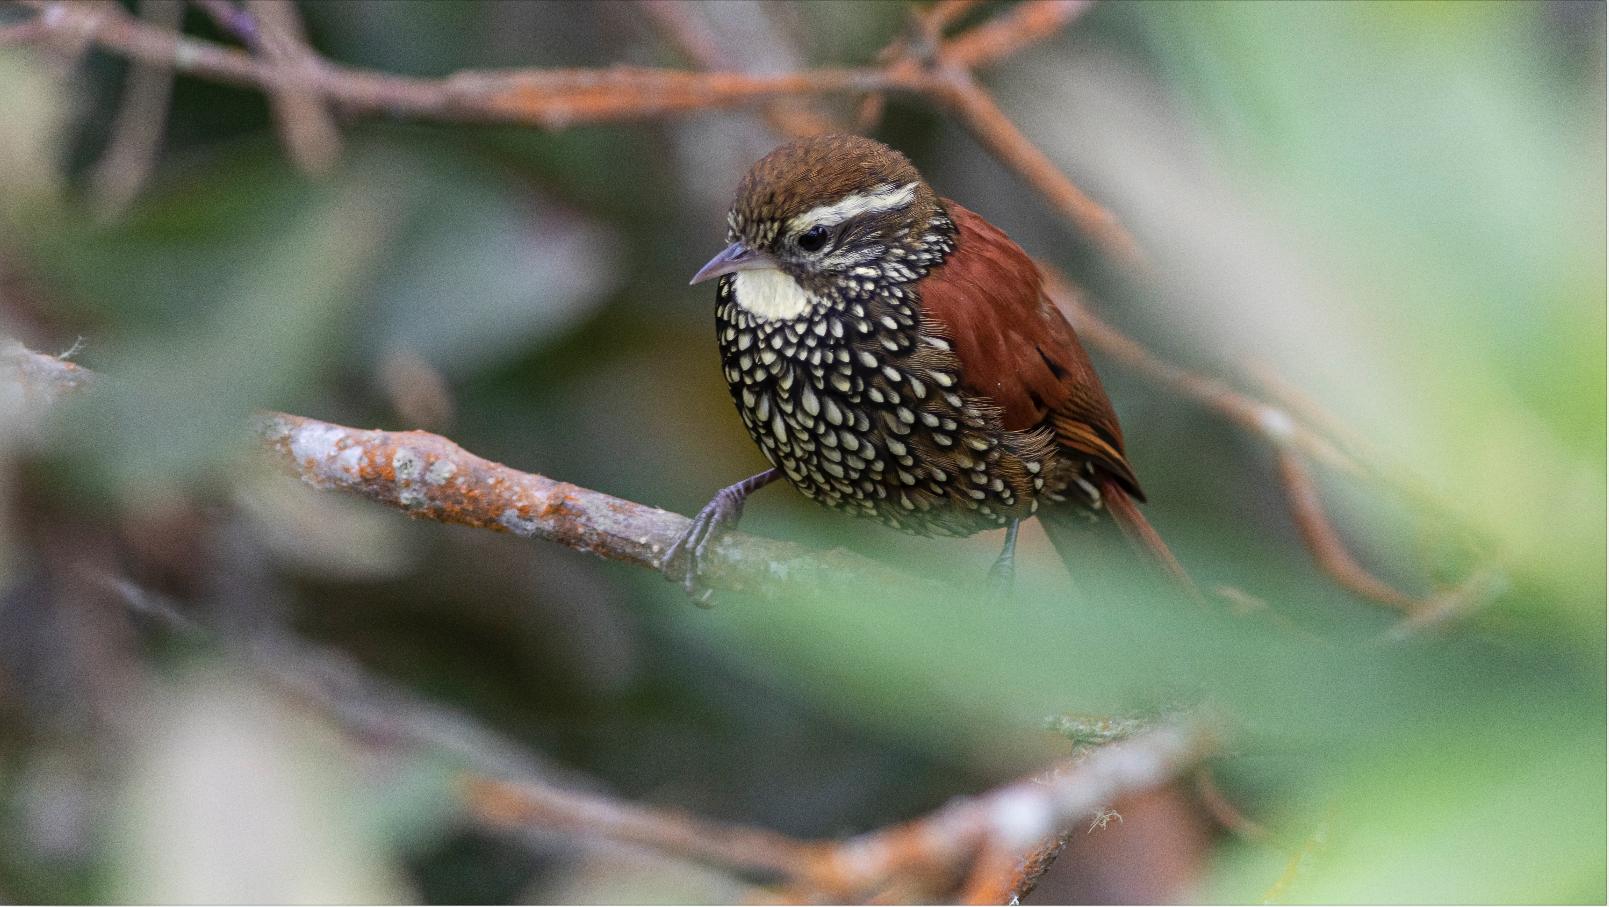 Margarornis Squamiger - Pearled Tree